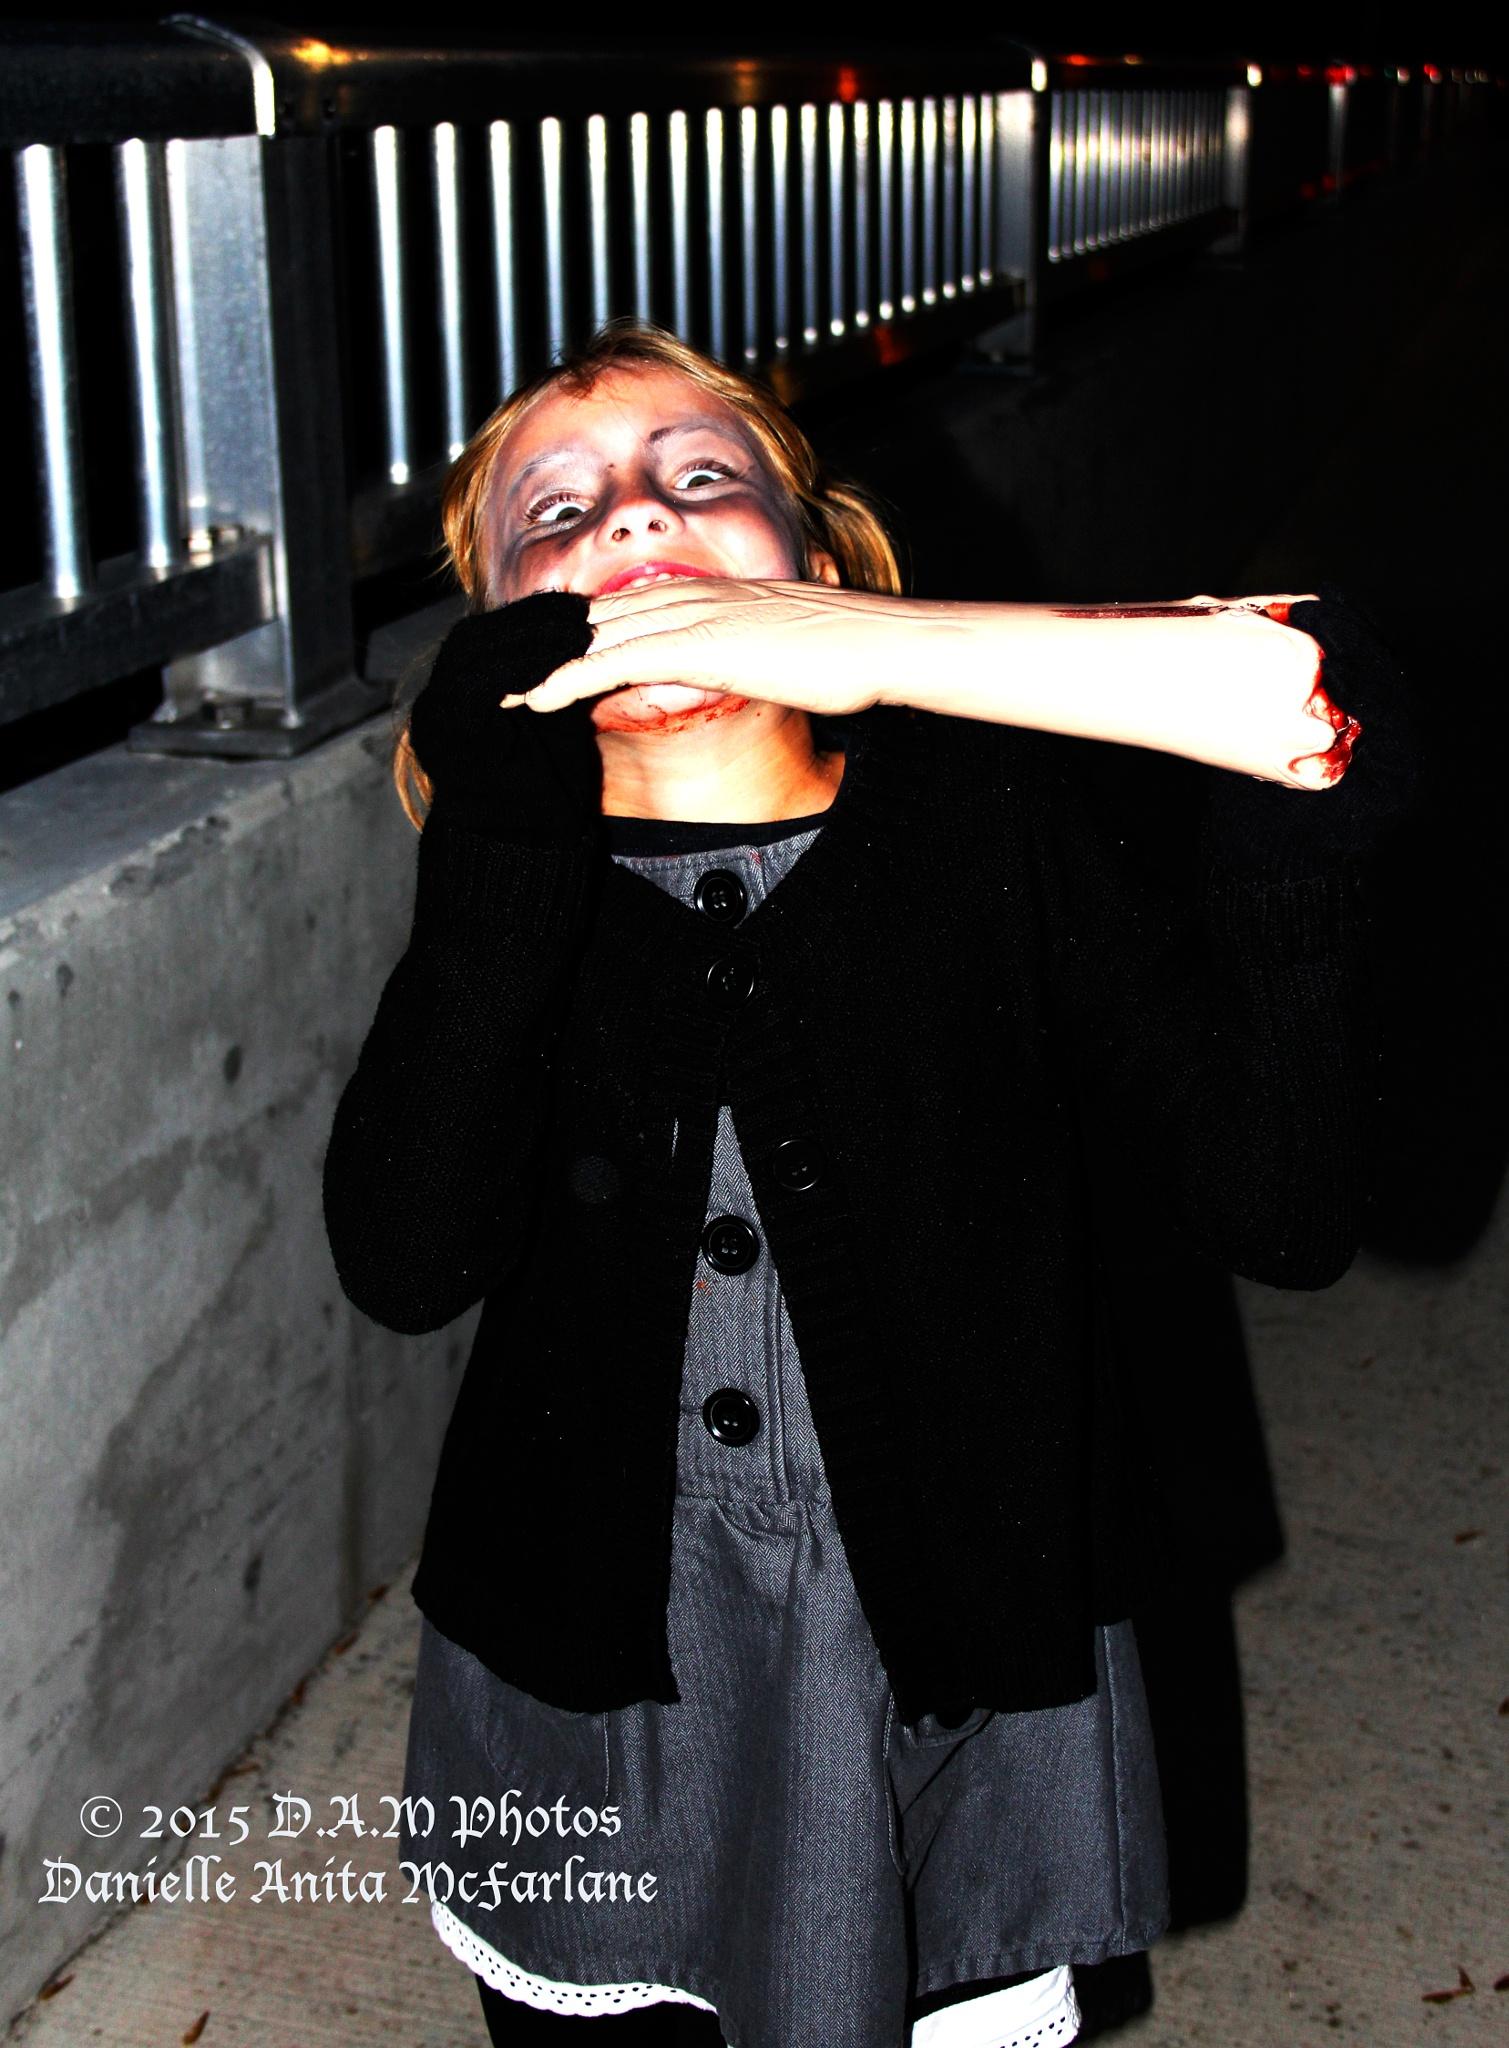 Zombie Child by Dz_Photography